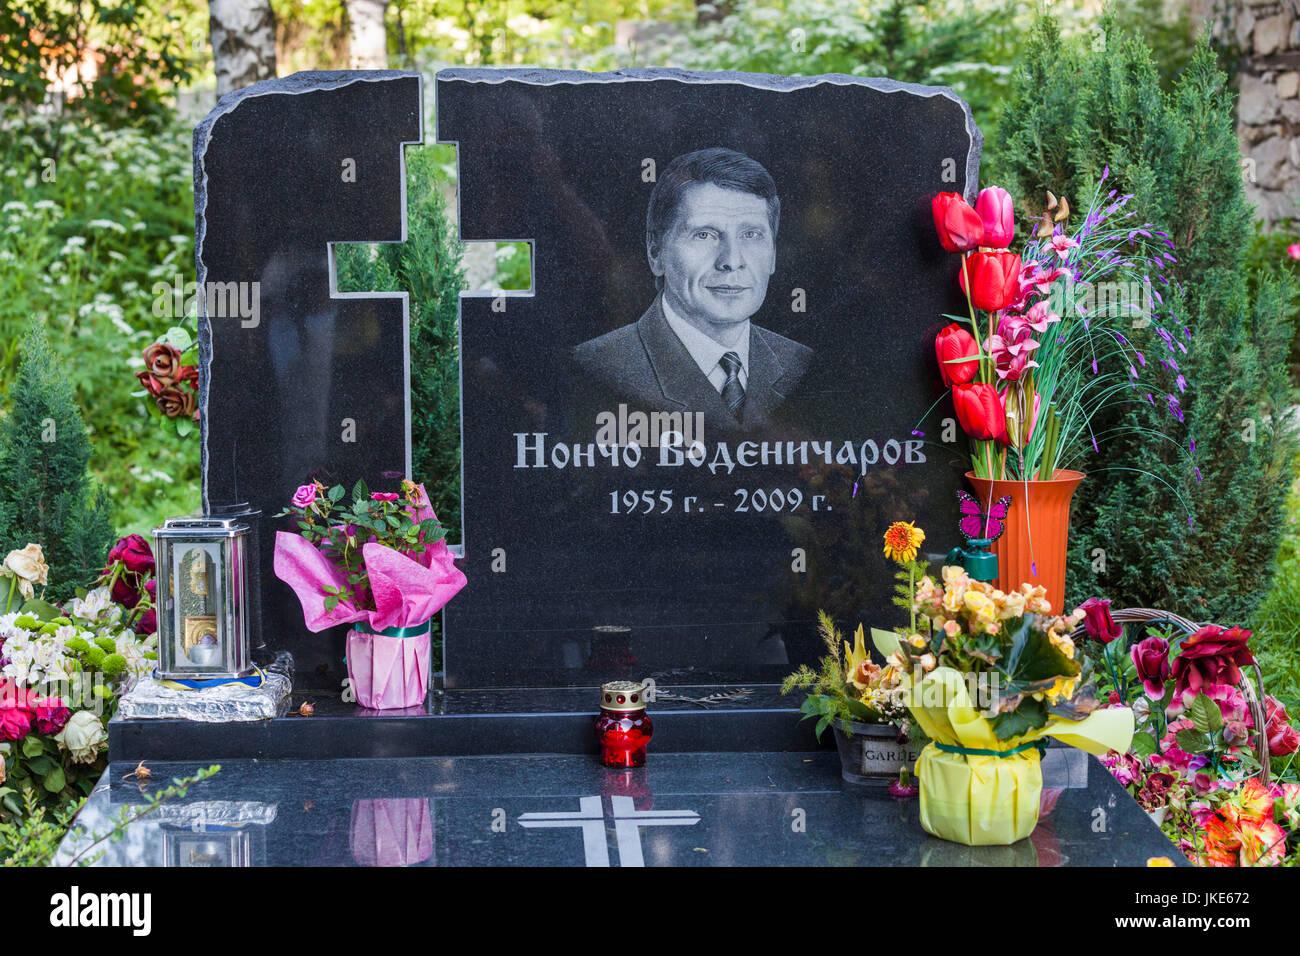 Bulgaria, Central Mountains, Koprivshtitsa, grave of political leader Nontso Vodenicharov - Stock Image